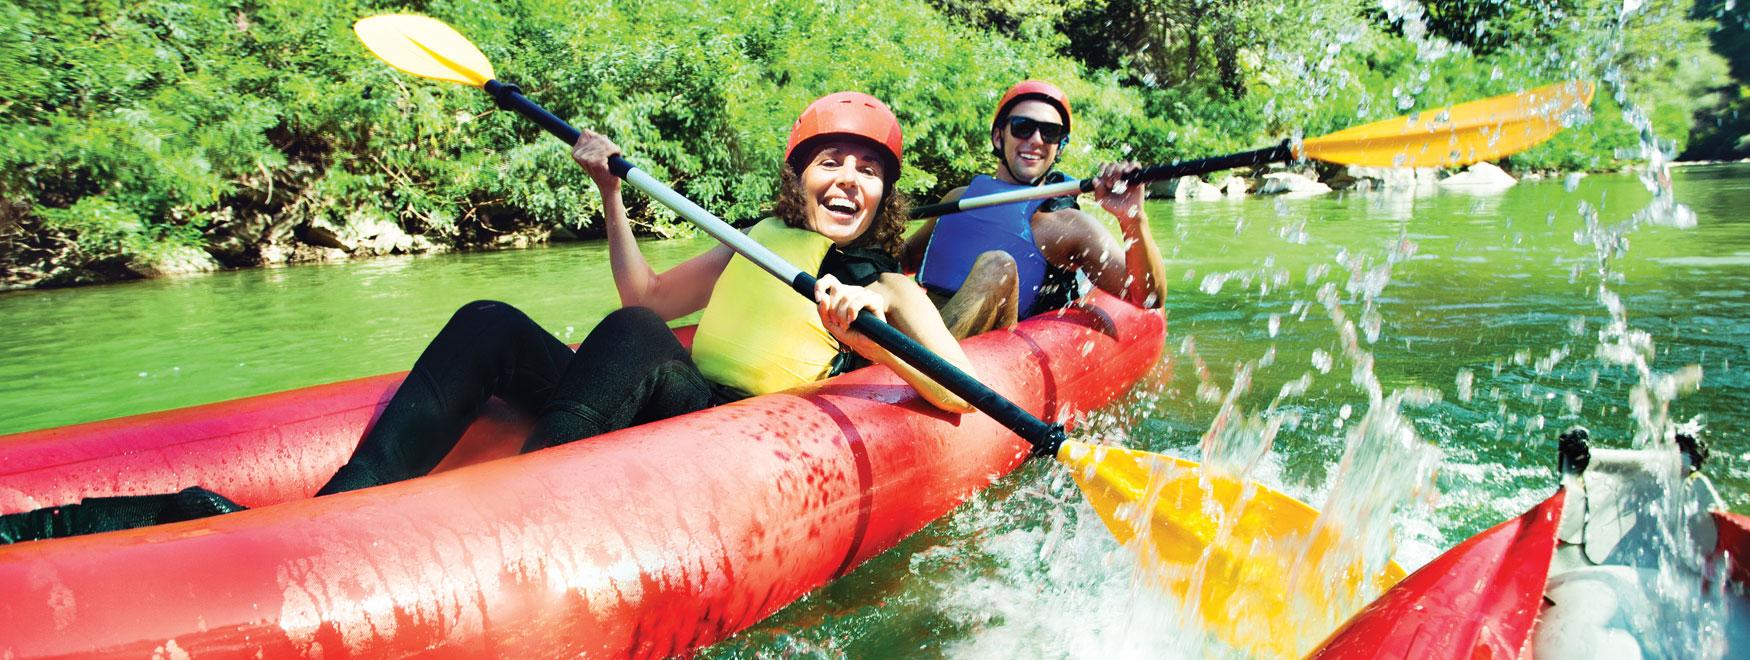 Kanu-Kajak fahren auf dem Fluss Lez